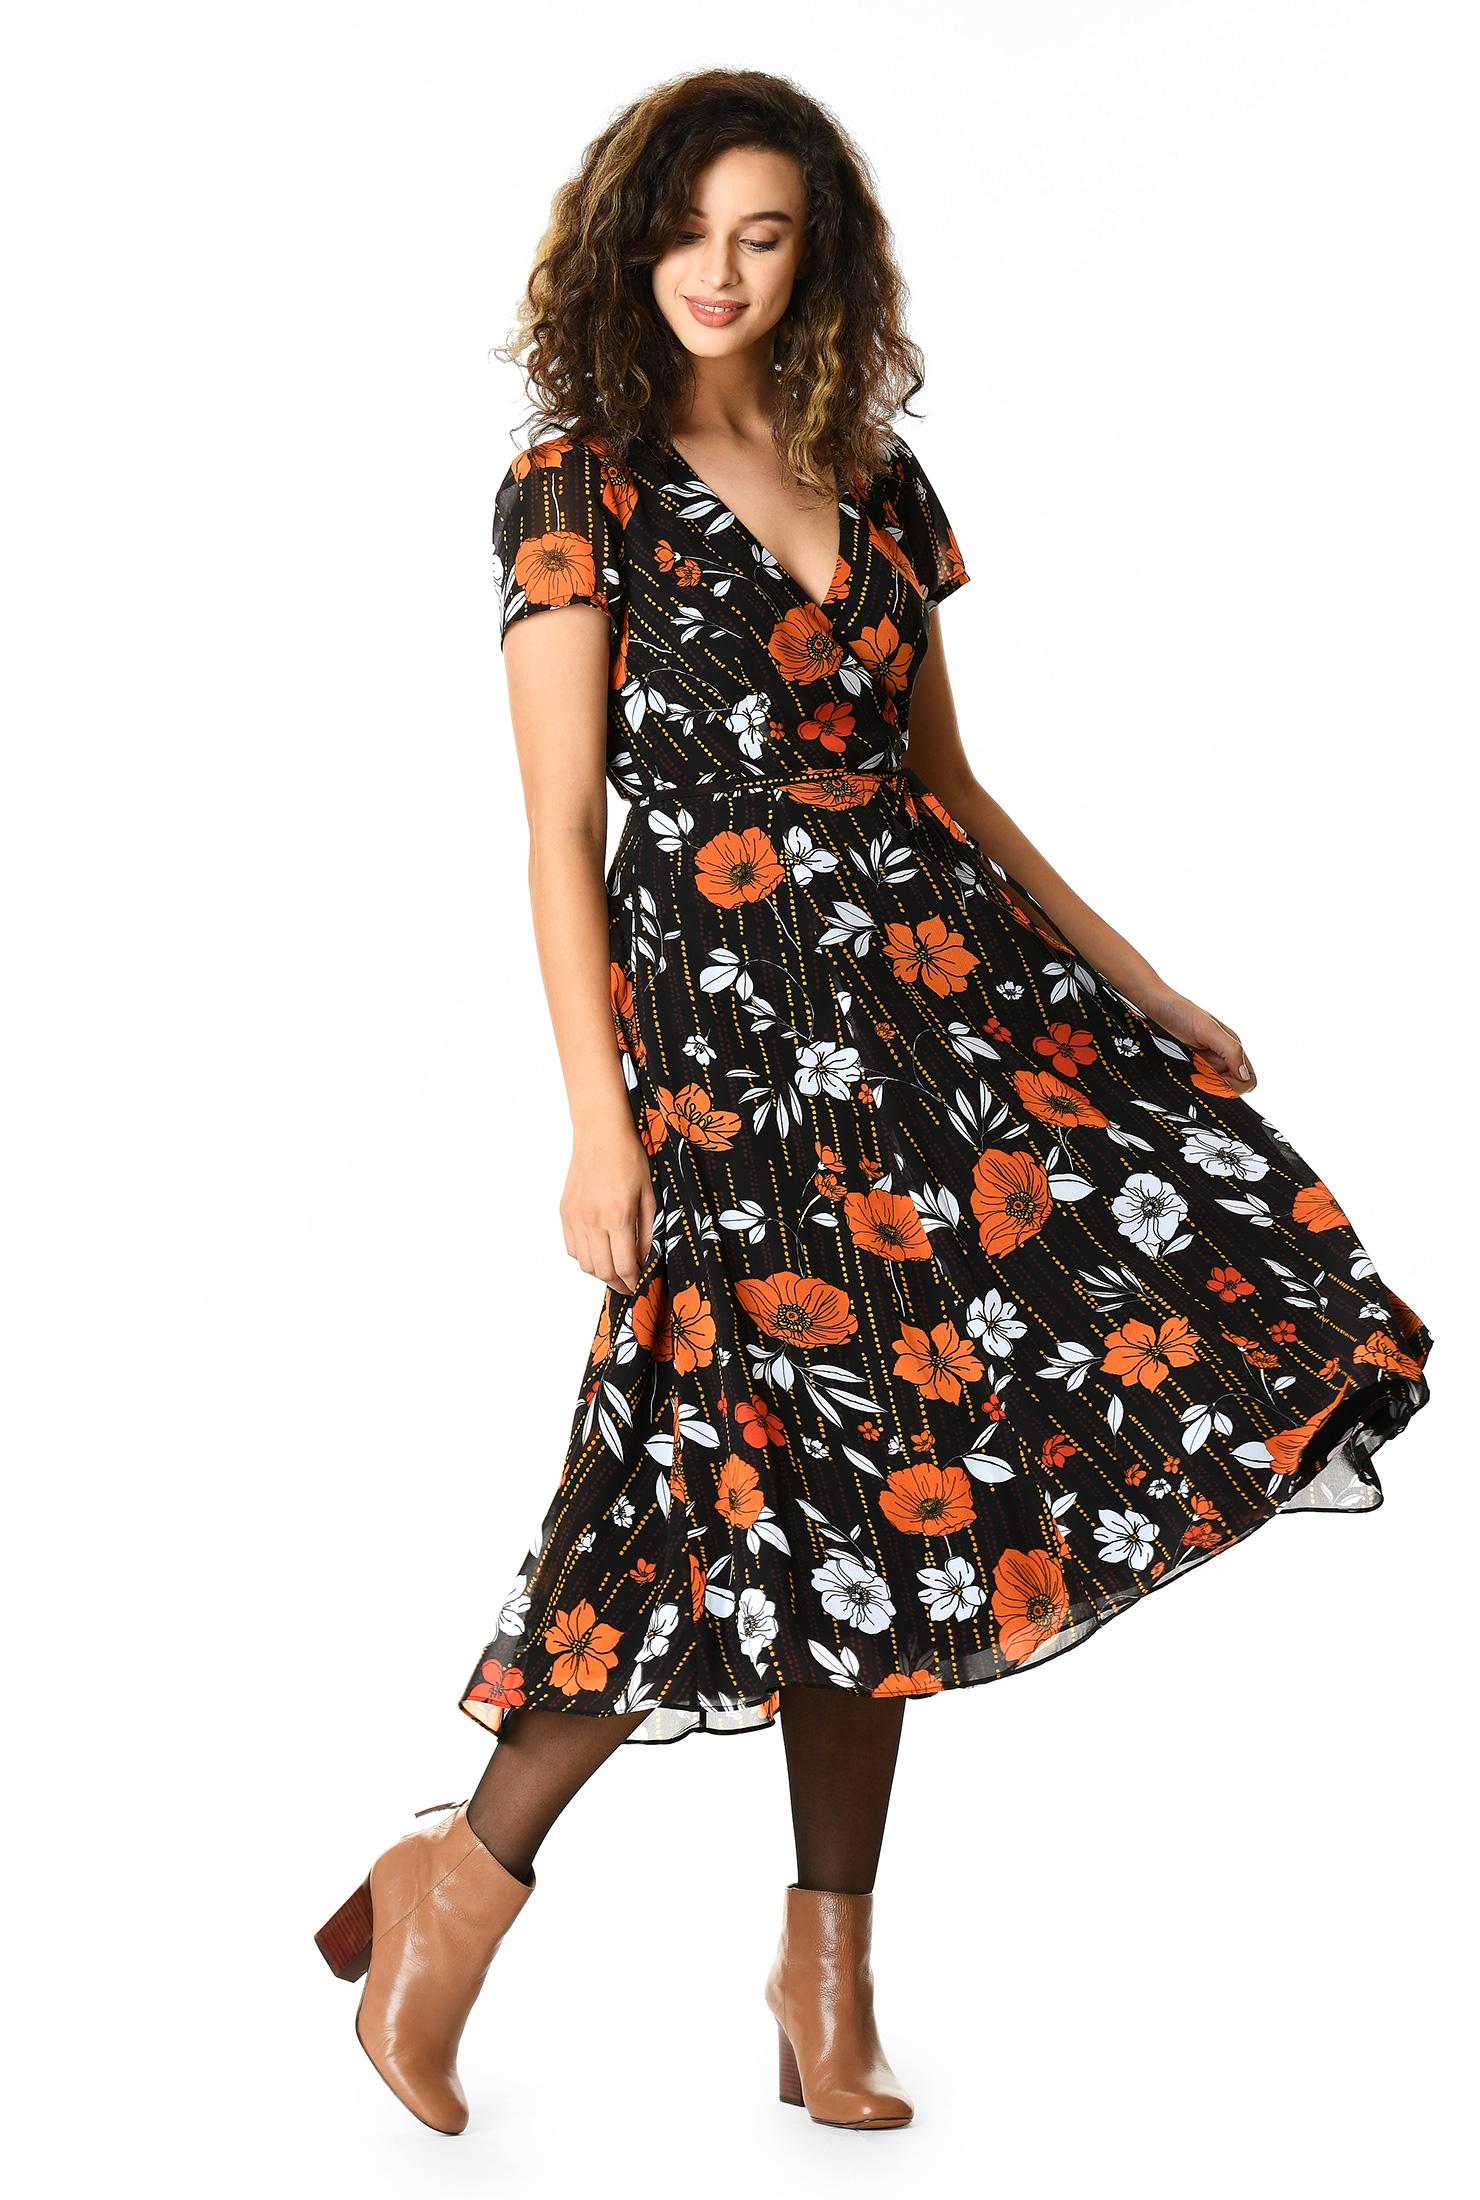 0f400543b70ee Women s Fashion Clothing 0-36W and Custom